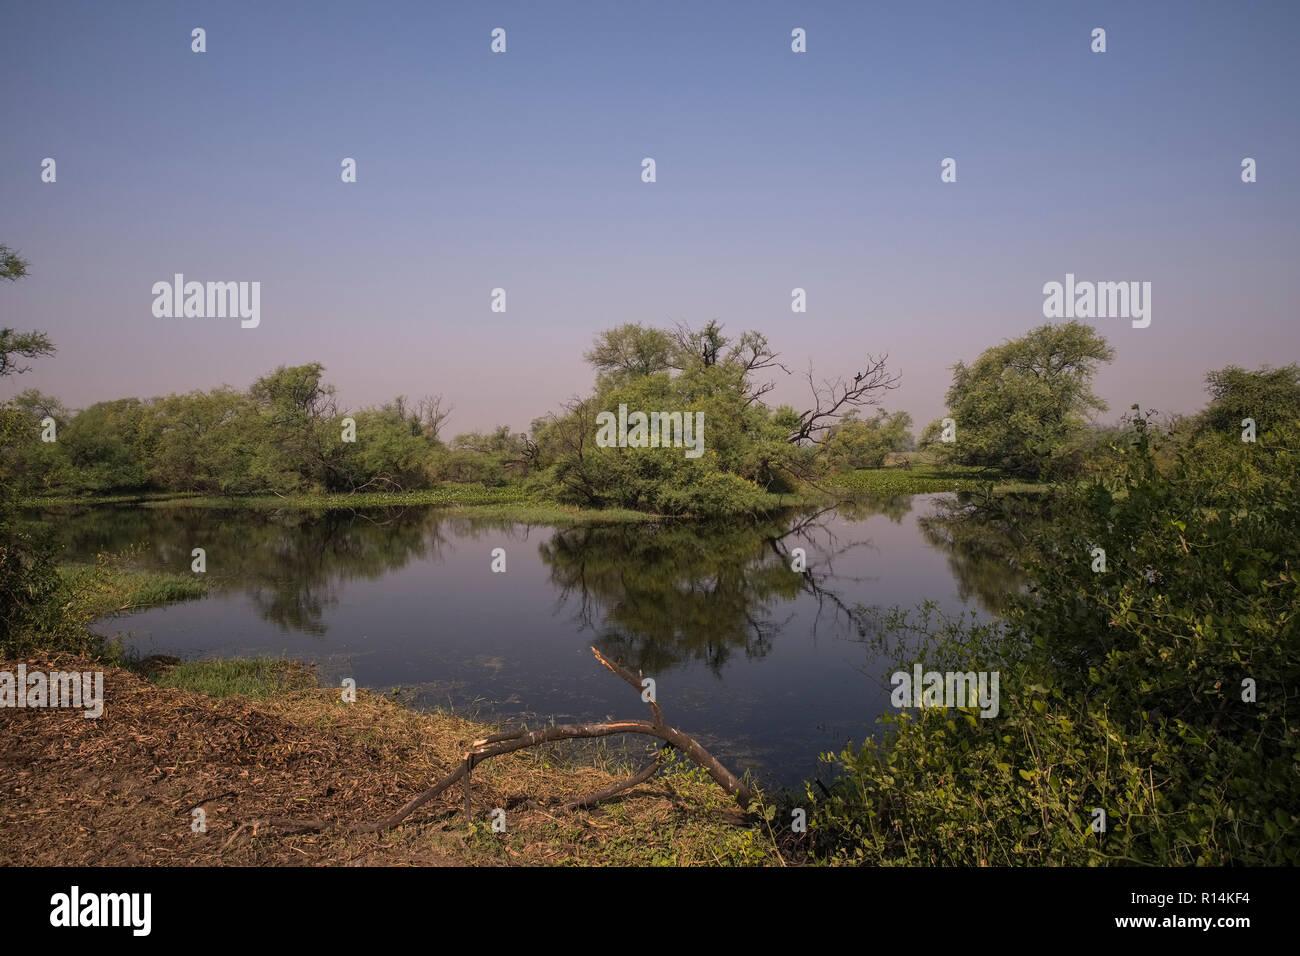 Bharatpur Bird Sanctuary,landscape,wetlands, habitat, grey hornbills,purple herons,painted storks, dependent on water level,Rajasthan,India. - Stock Image